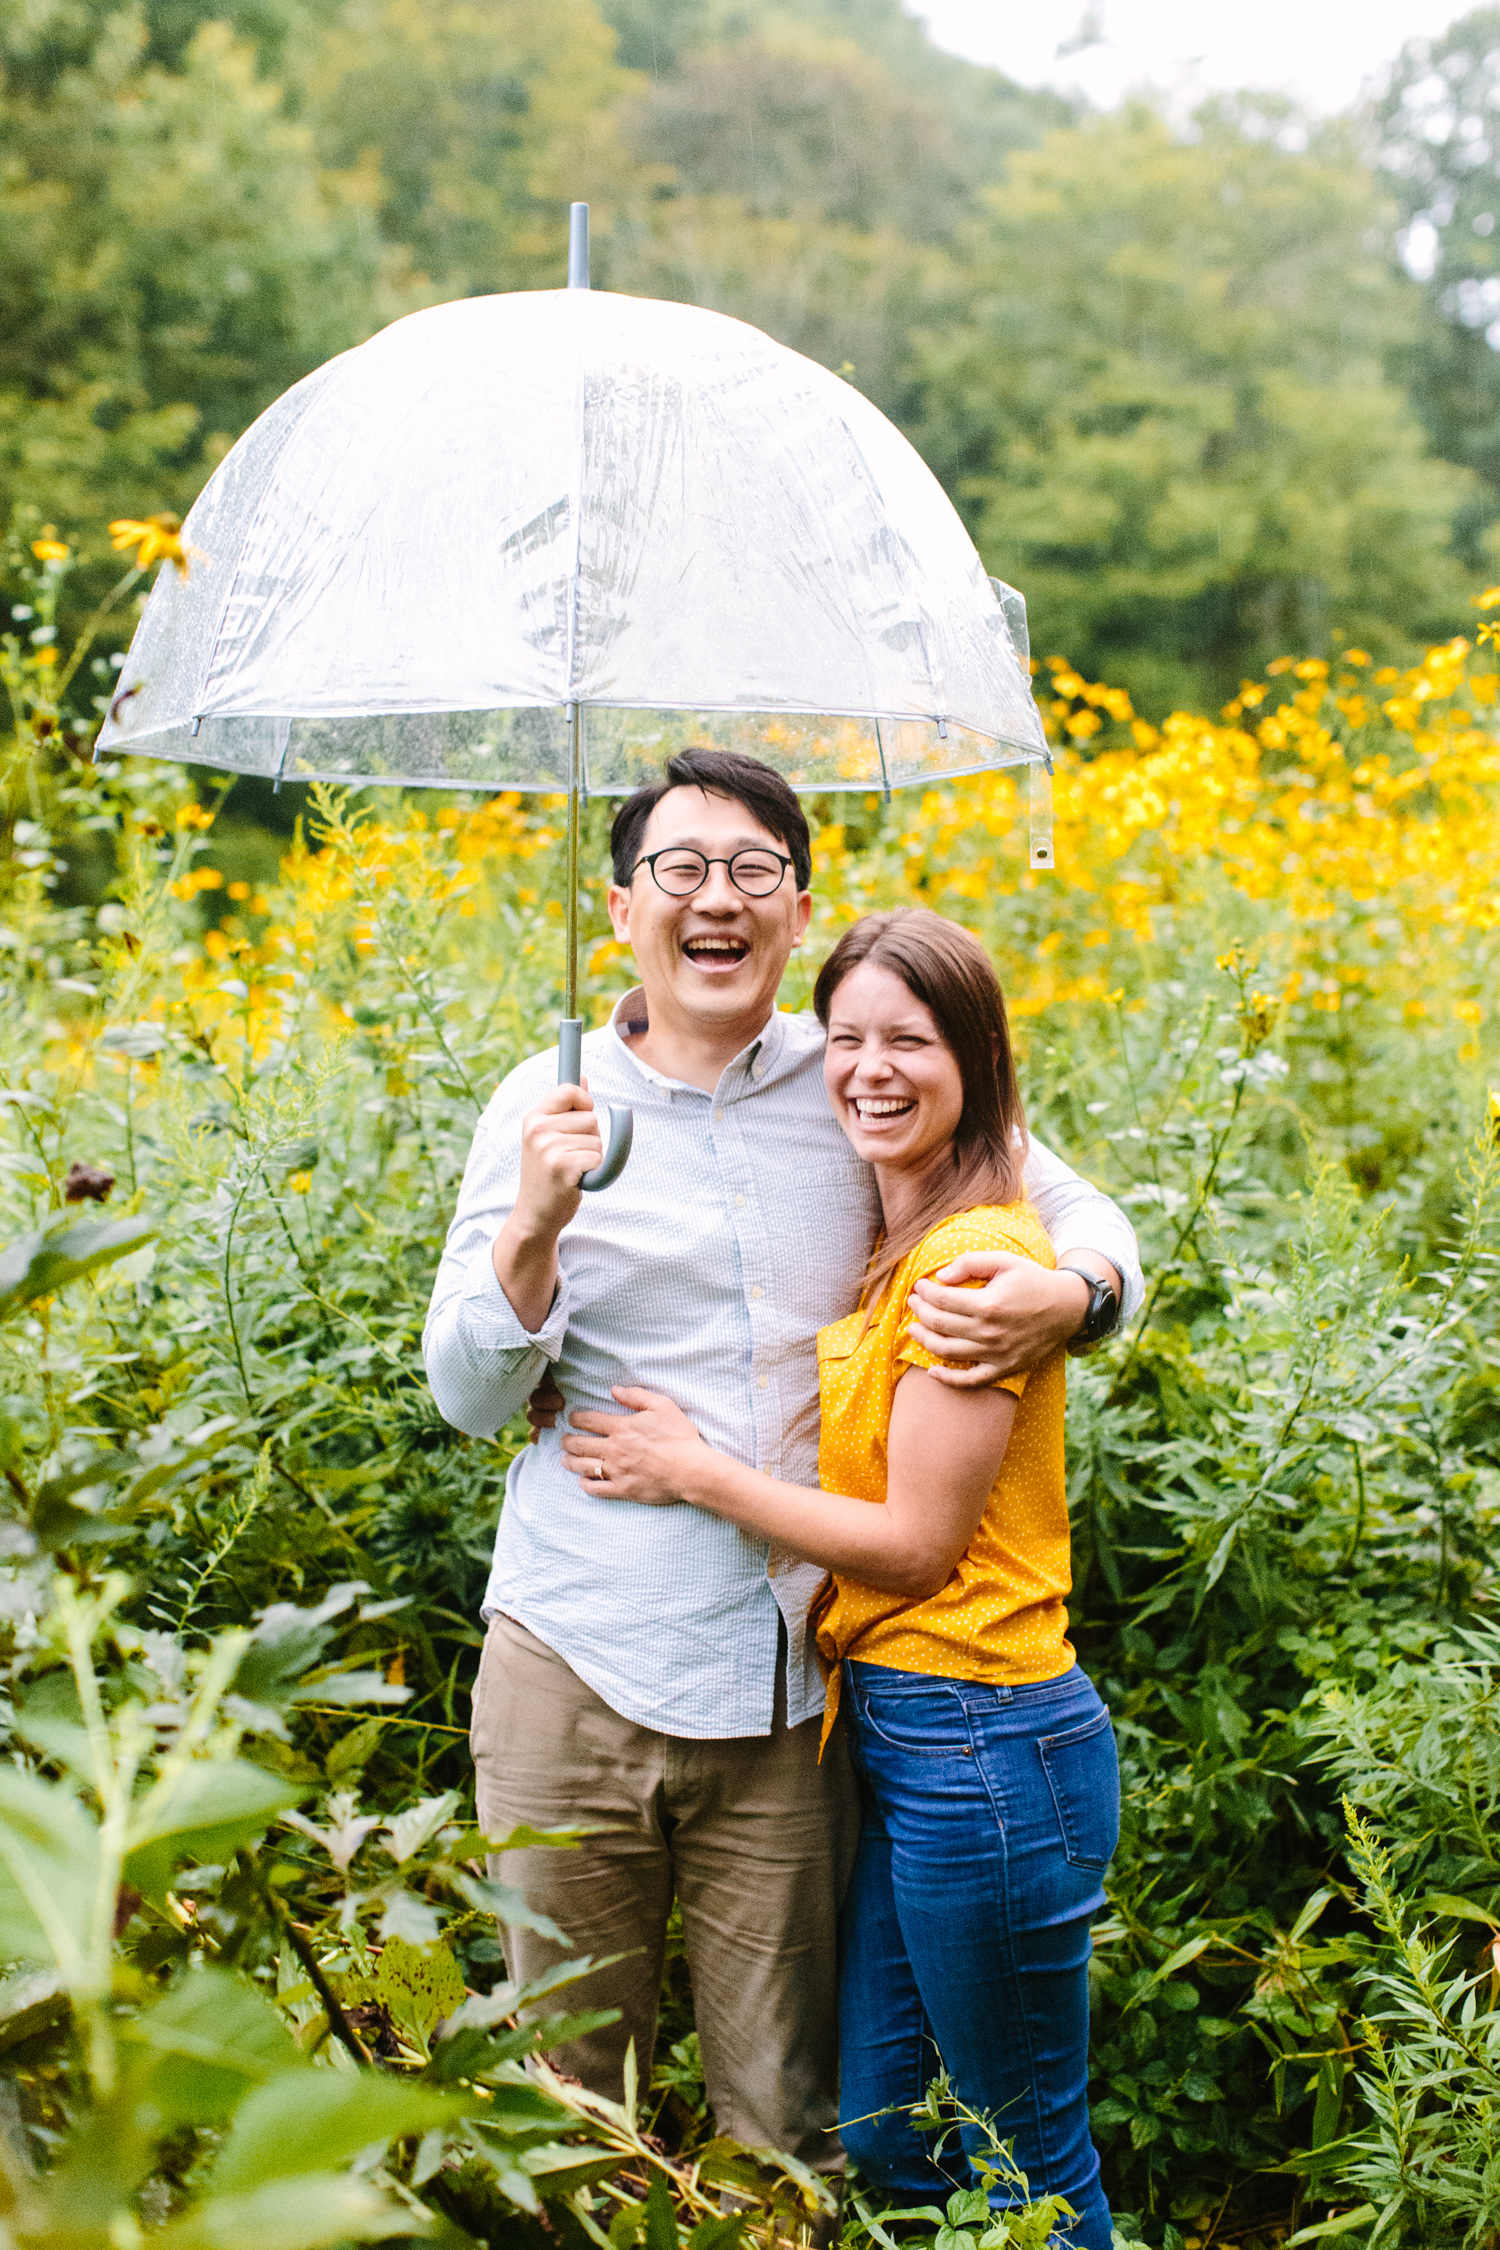 Sung & Cameron - Rainy Wildflower Field Engagement